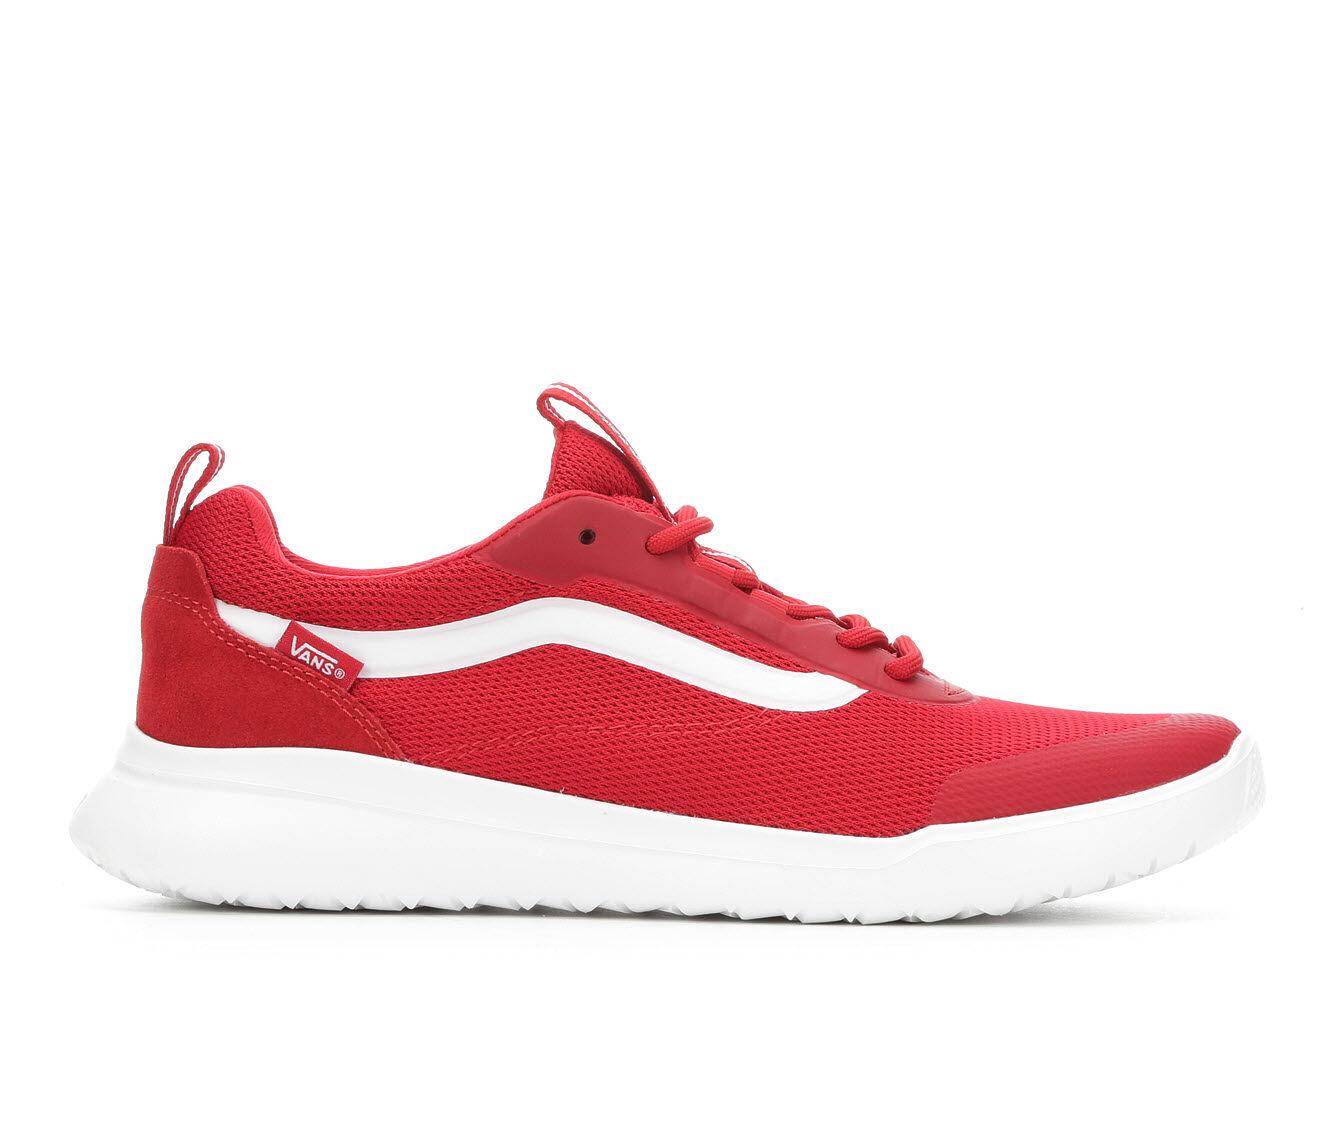 Buy Limited Edition Men's Vans Cerus RW-M Skate Shoes Red/Wht